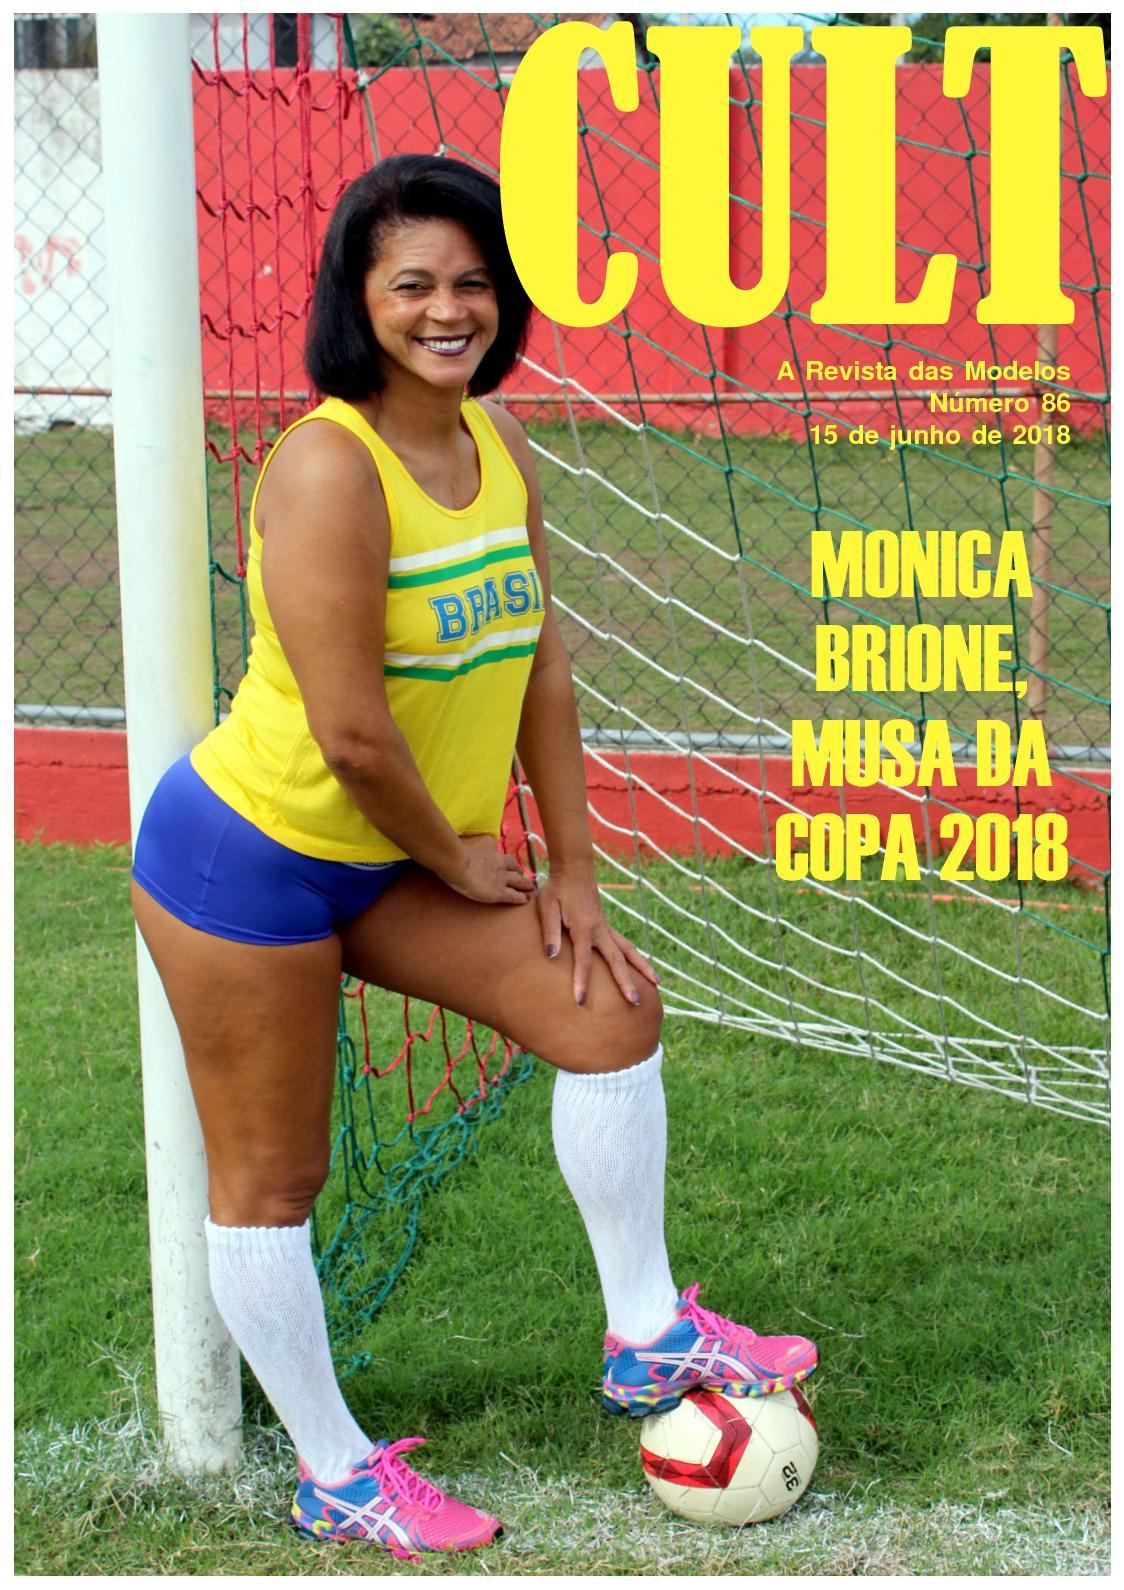 CULT 86, a revista das modelos - MONICA BRIONE, Musa da Copa 2018